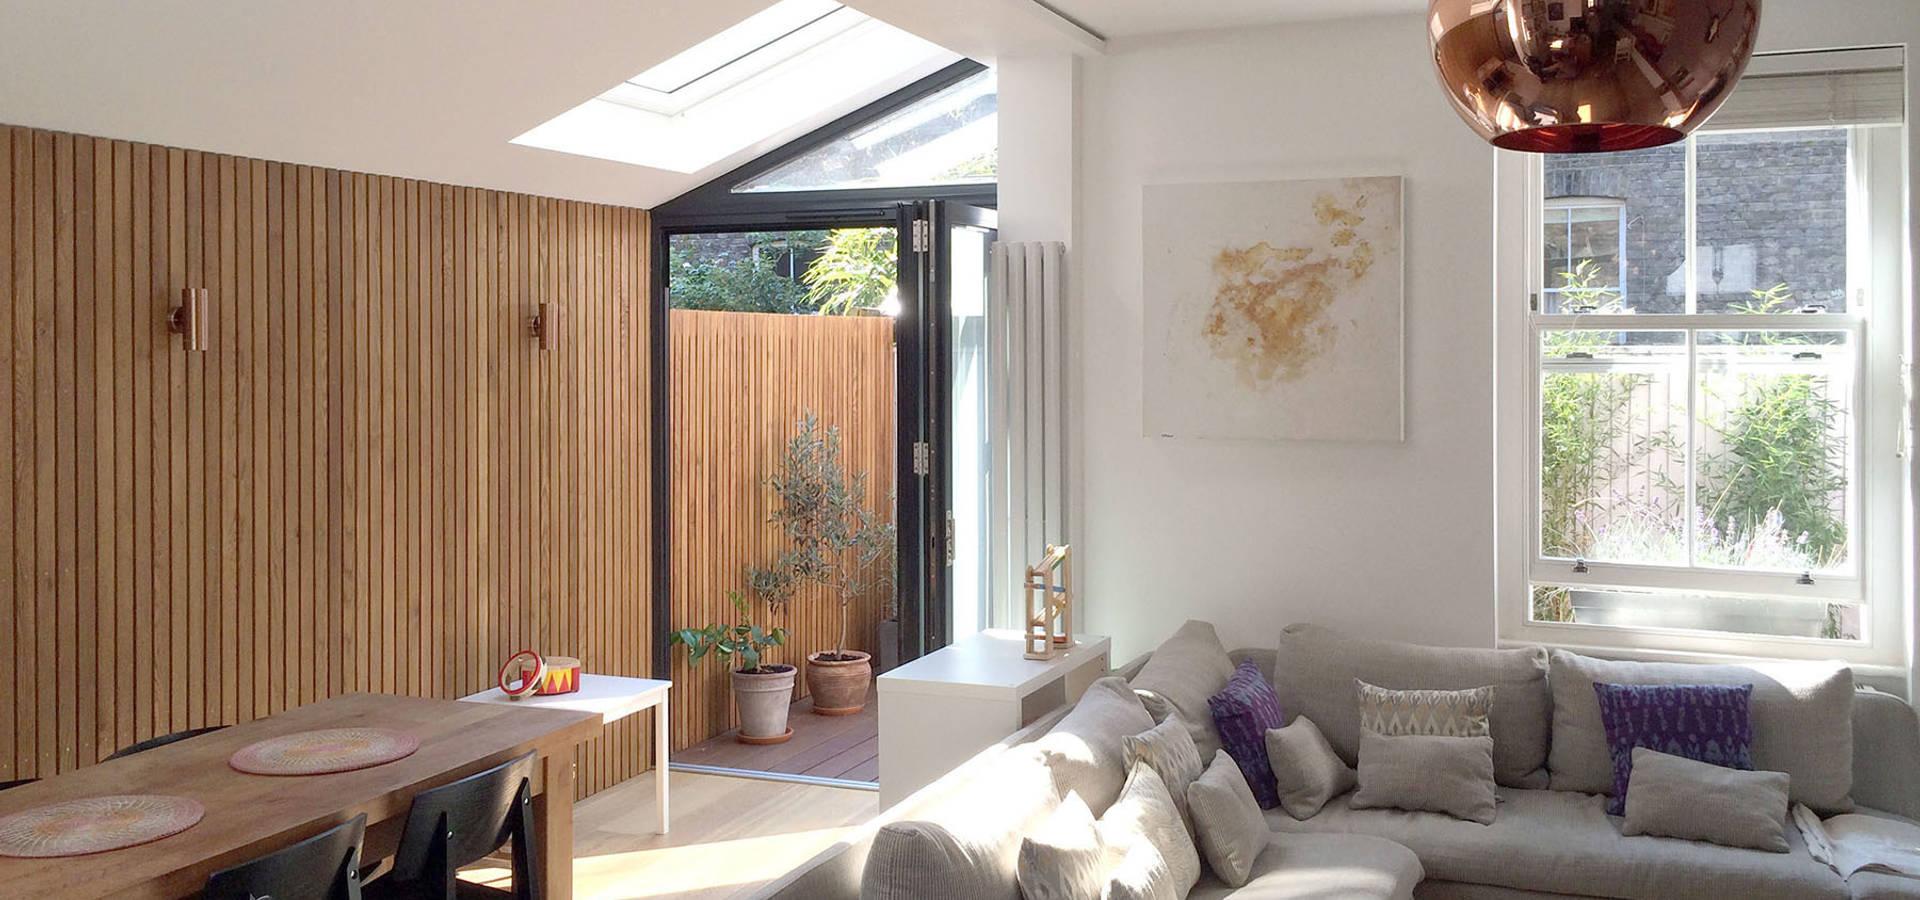 Proctor & Co. Architecture Ltd